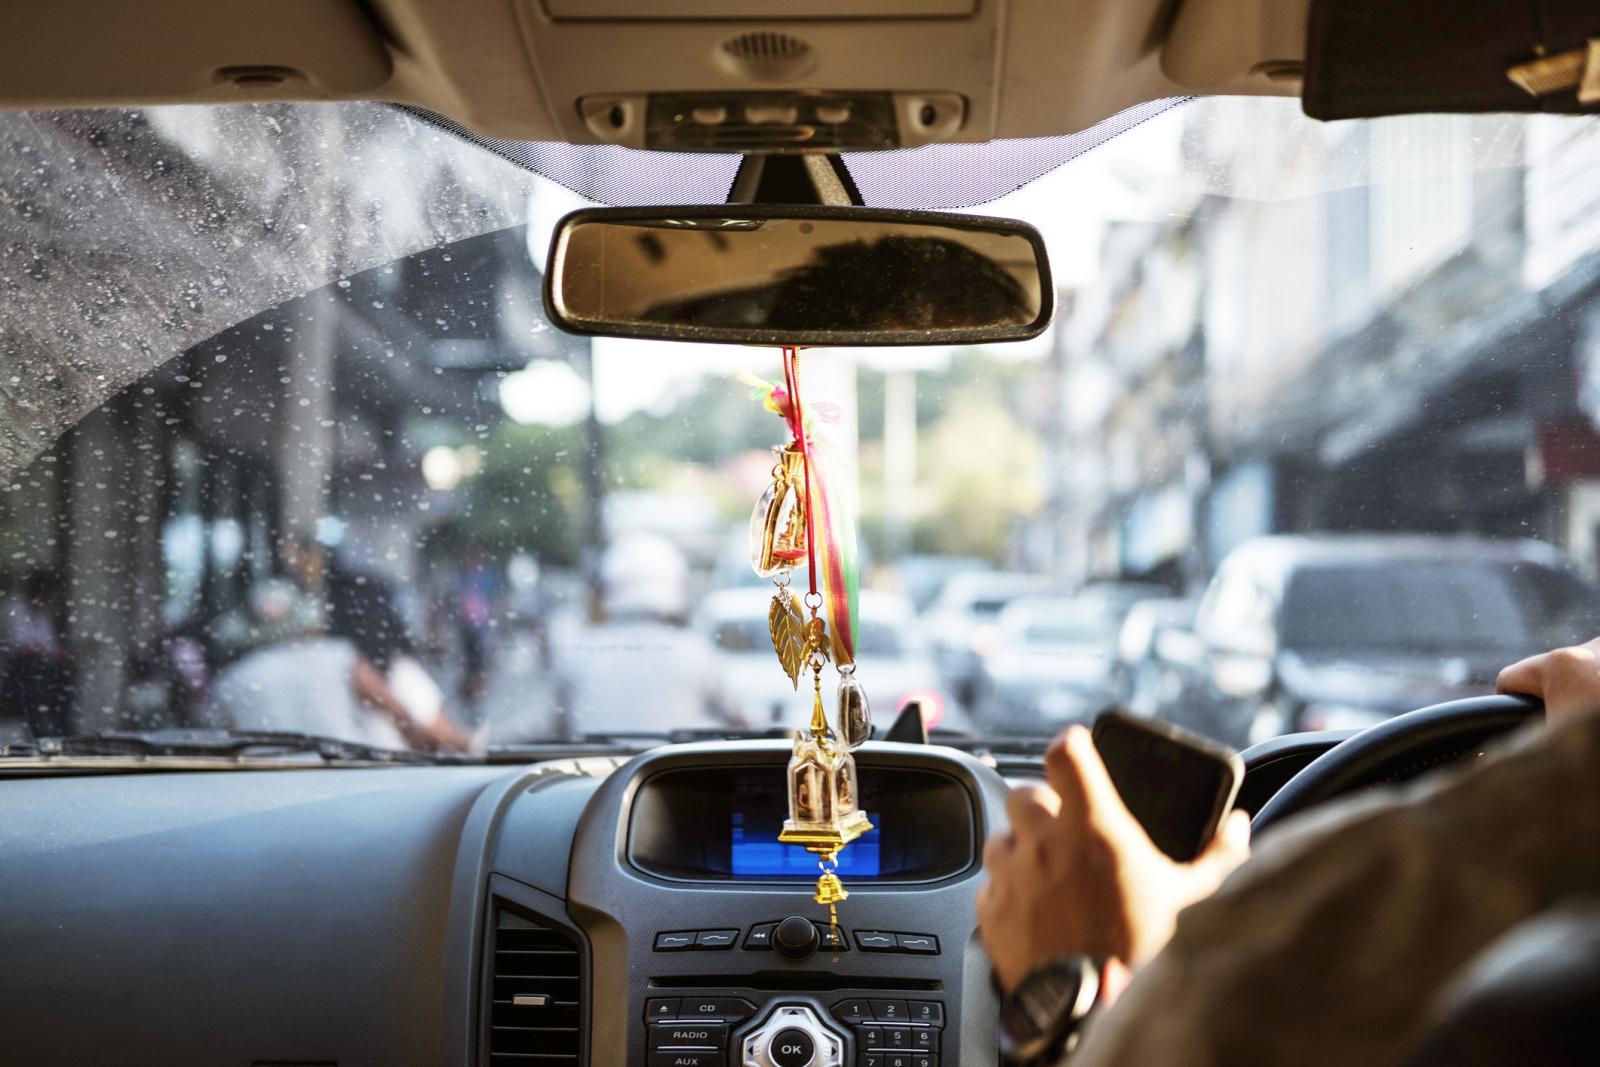 Amuletos feng shui colgados dentro del coche